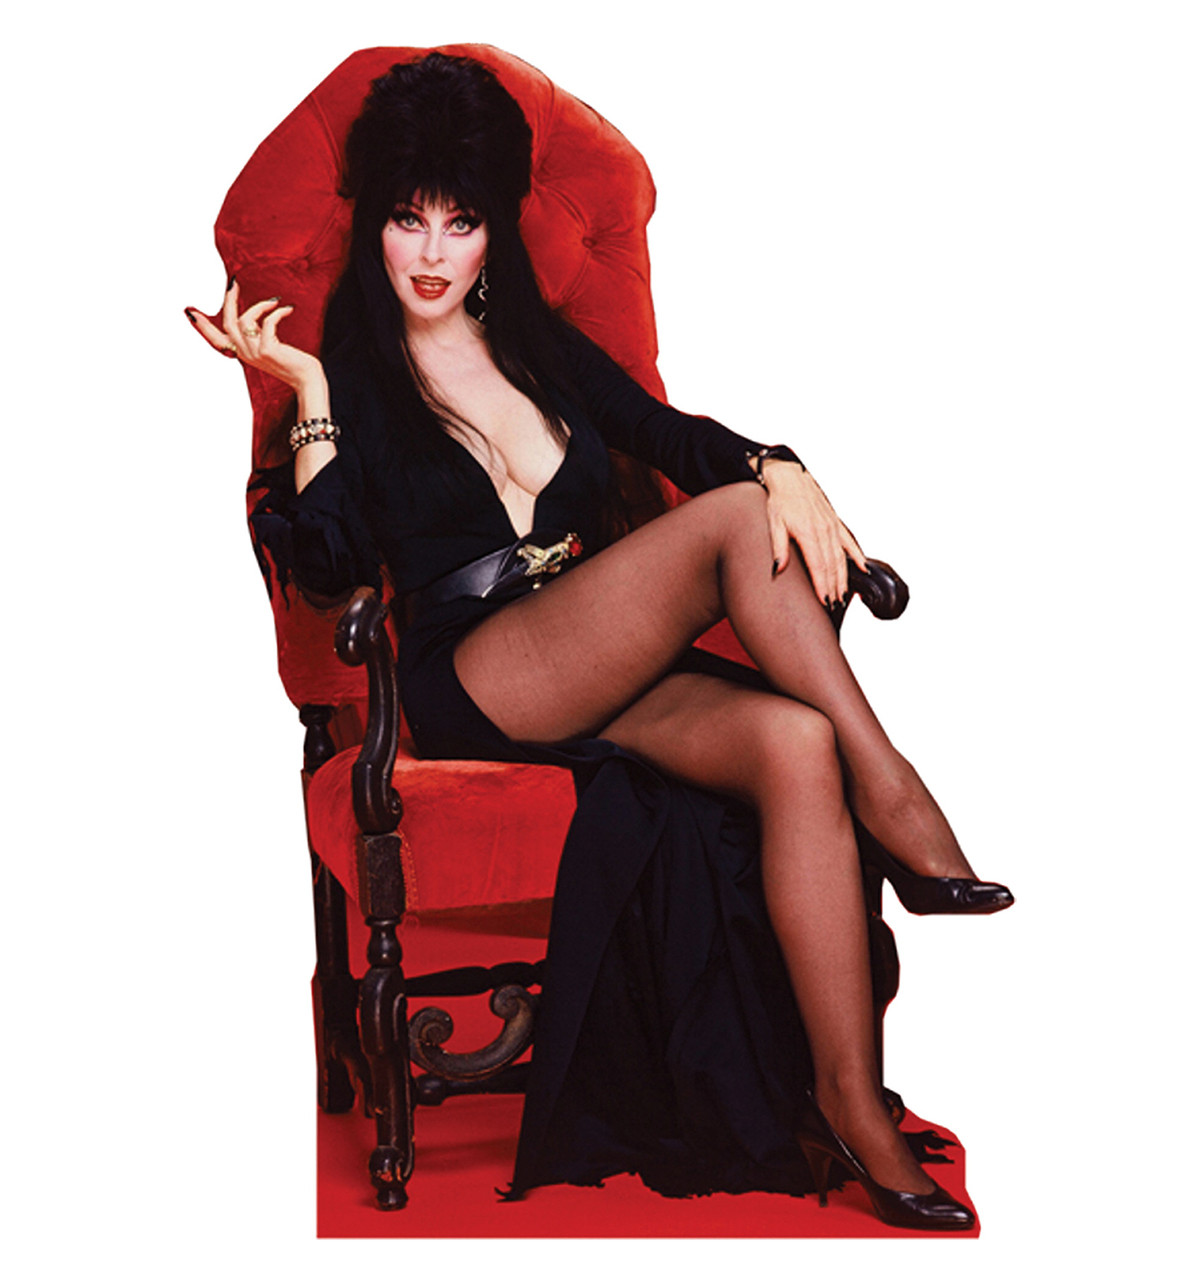 Life Size Elvira Chair Talking Cardboard Standup